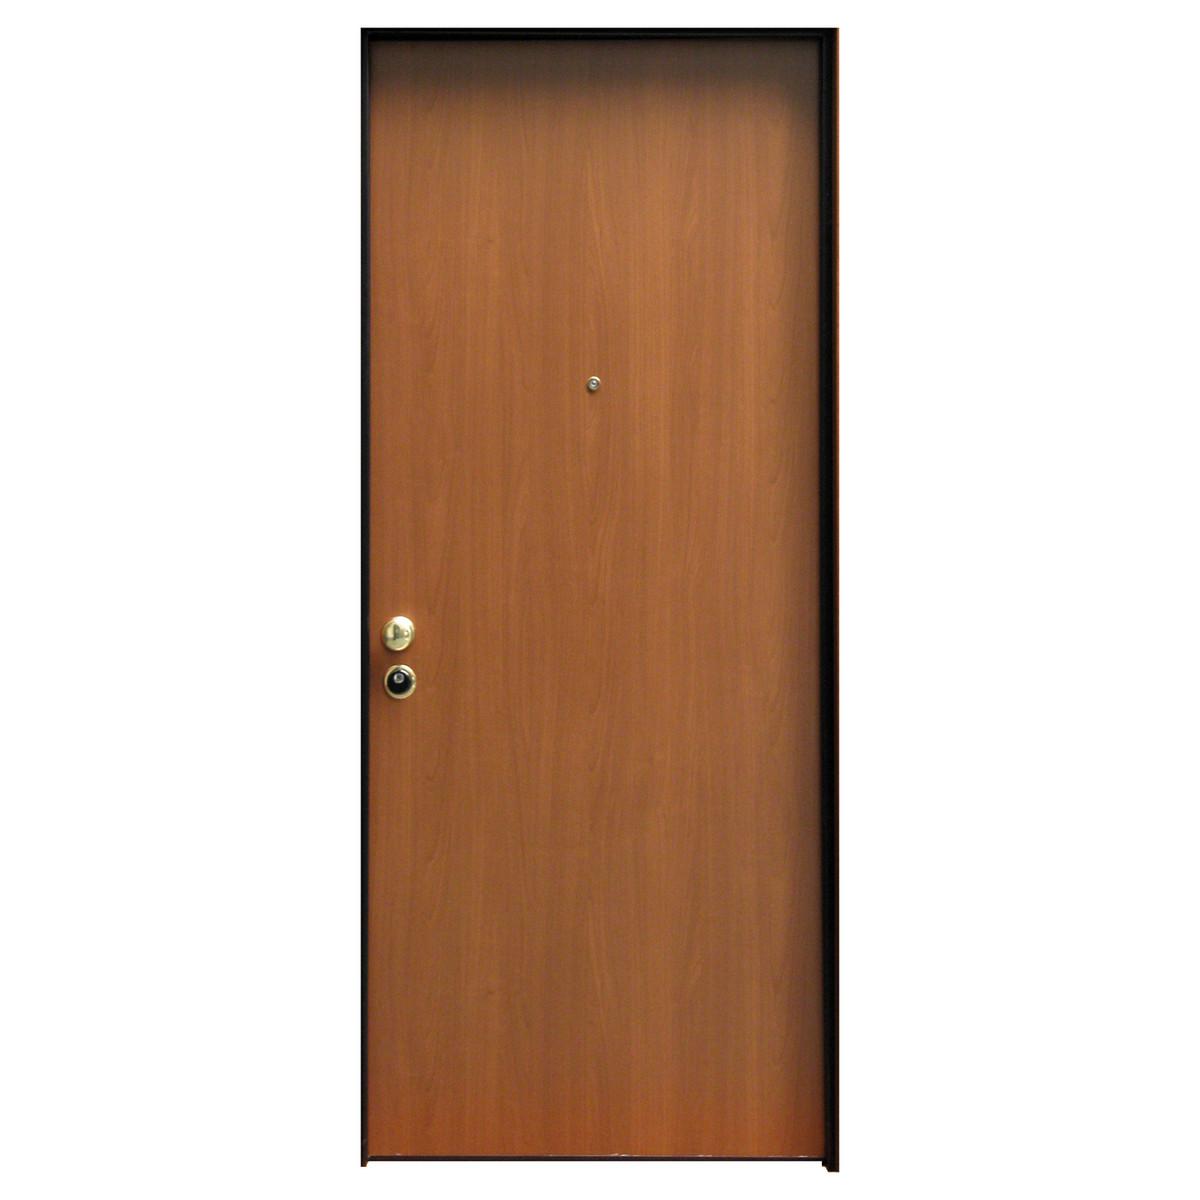 Porta Blindata Sparta 8 Dierre Classe 3 - Prezzi & migliori offerte